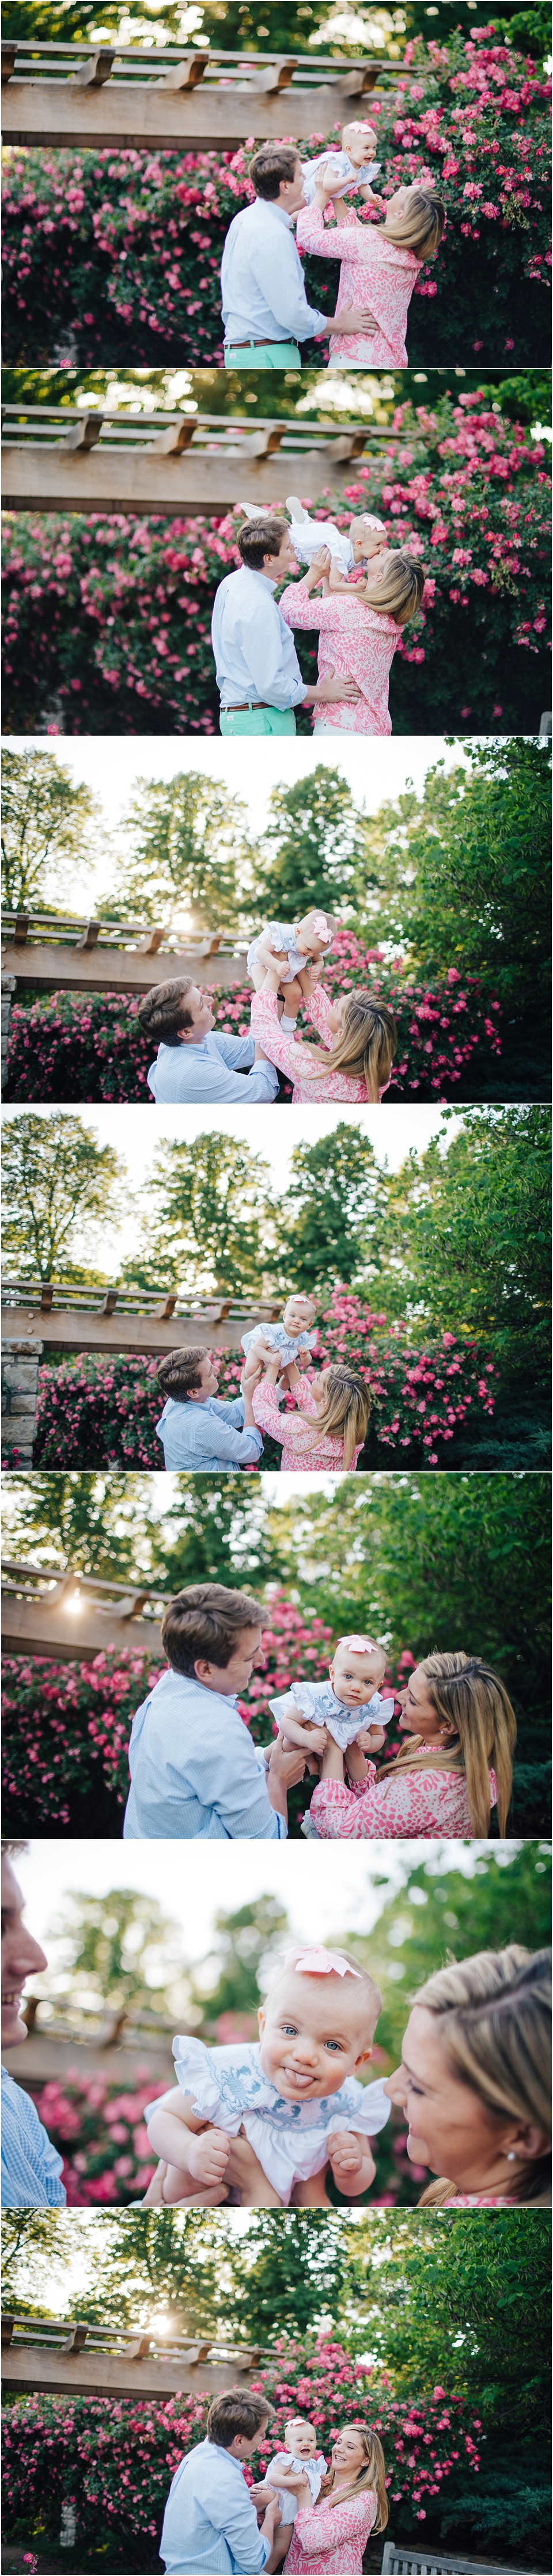 kansascityfamilyphotographer_0302